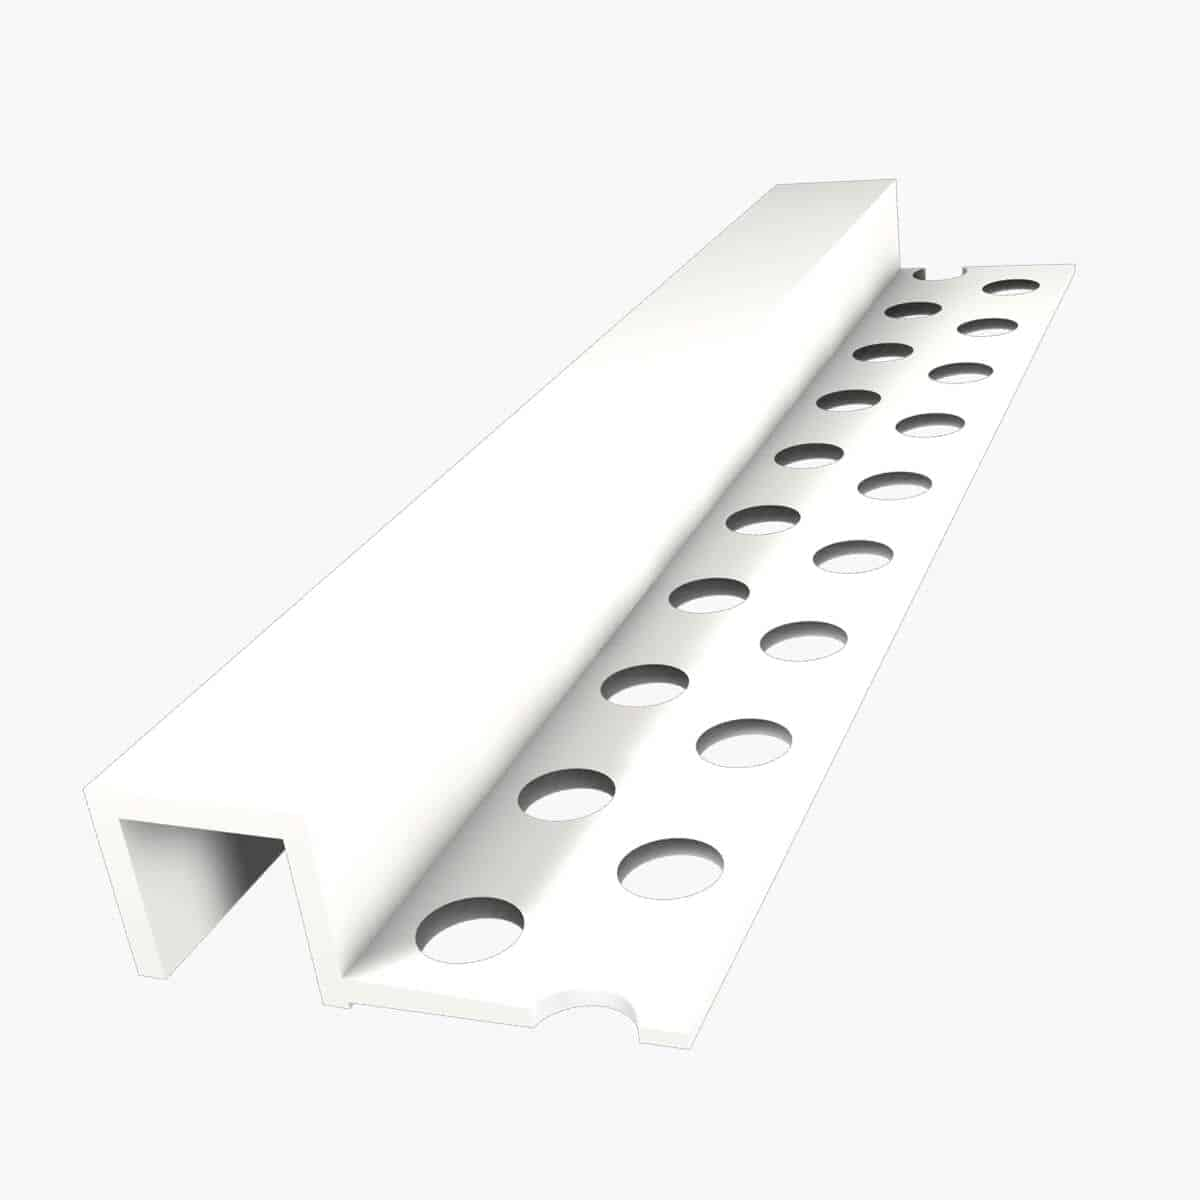 TEMPOLISTEL 108 - Profil alu pour ruban led